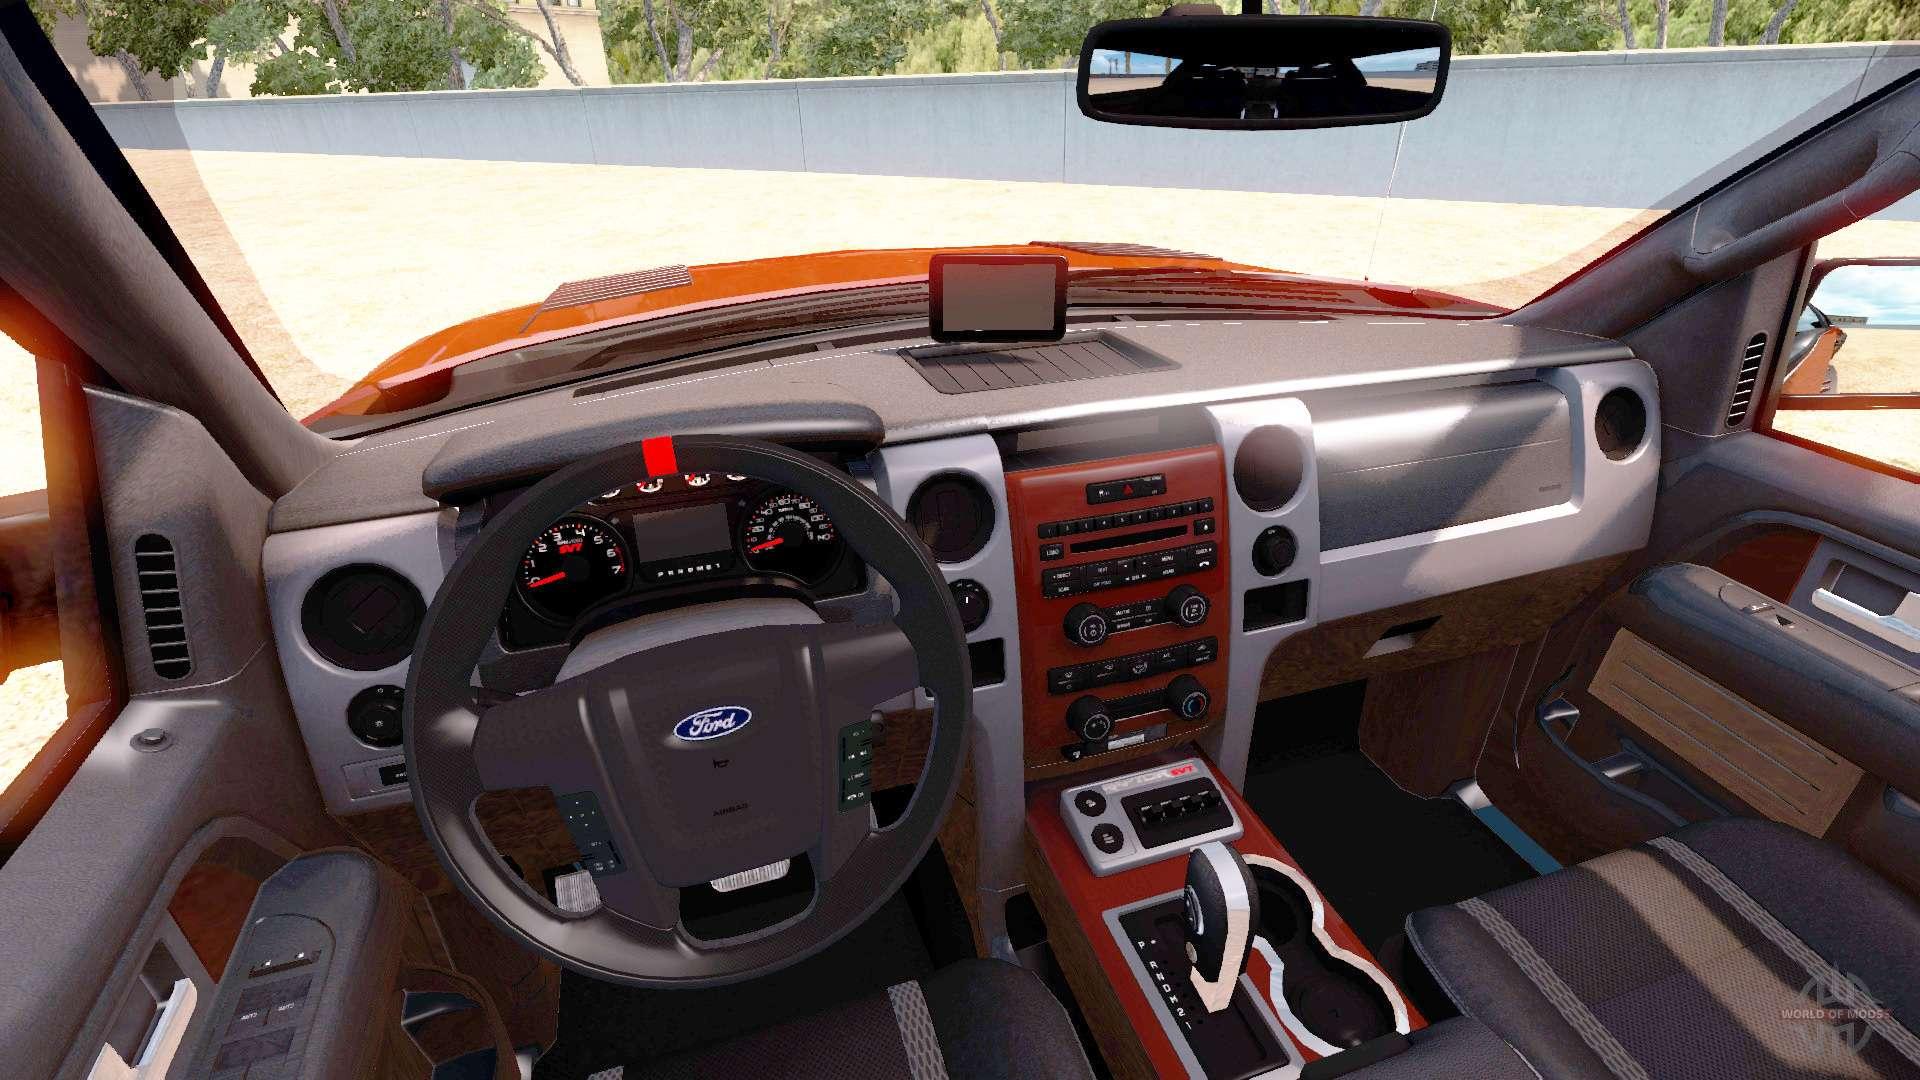 37a891b75c Ford F-150 SVT Raptor v1.1 for American Truck Simulator